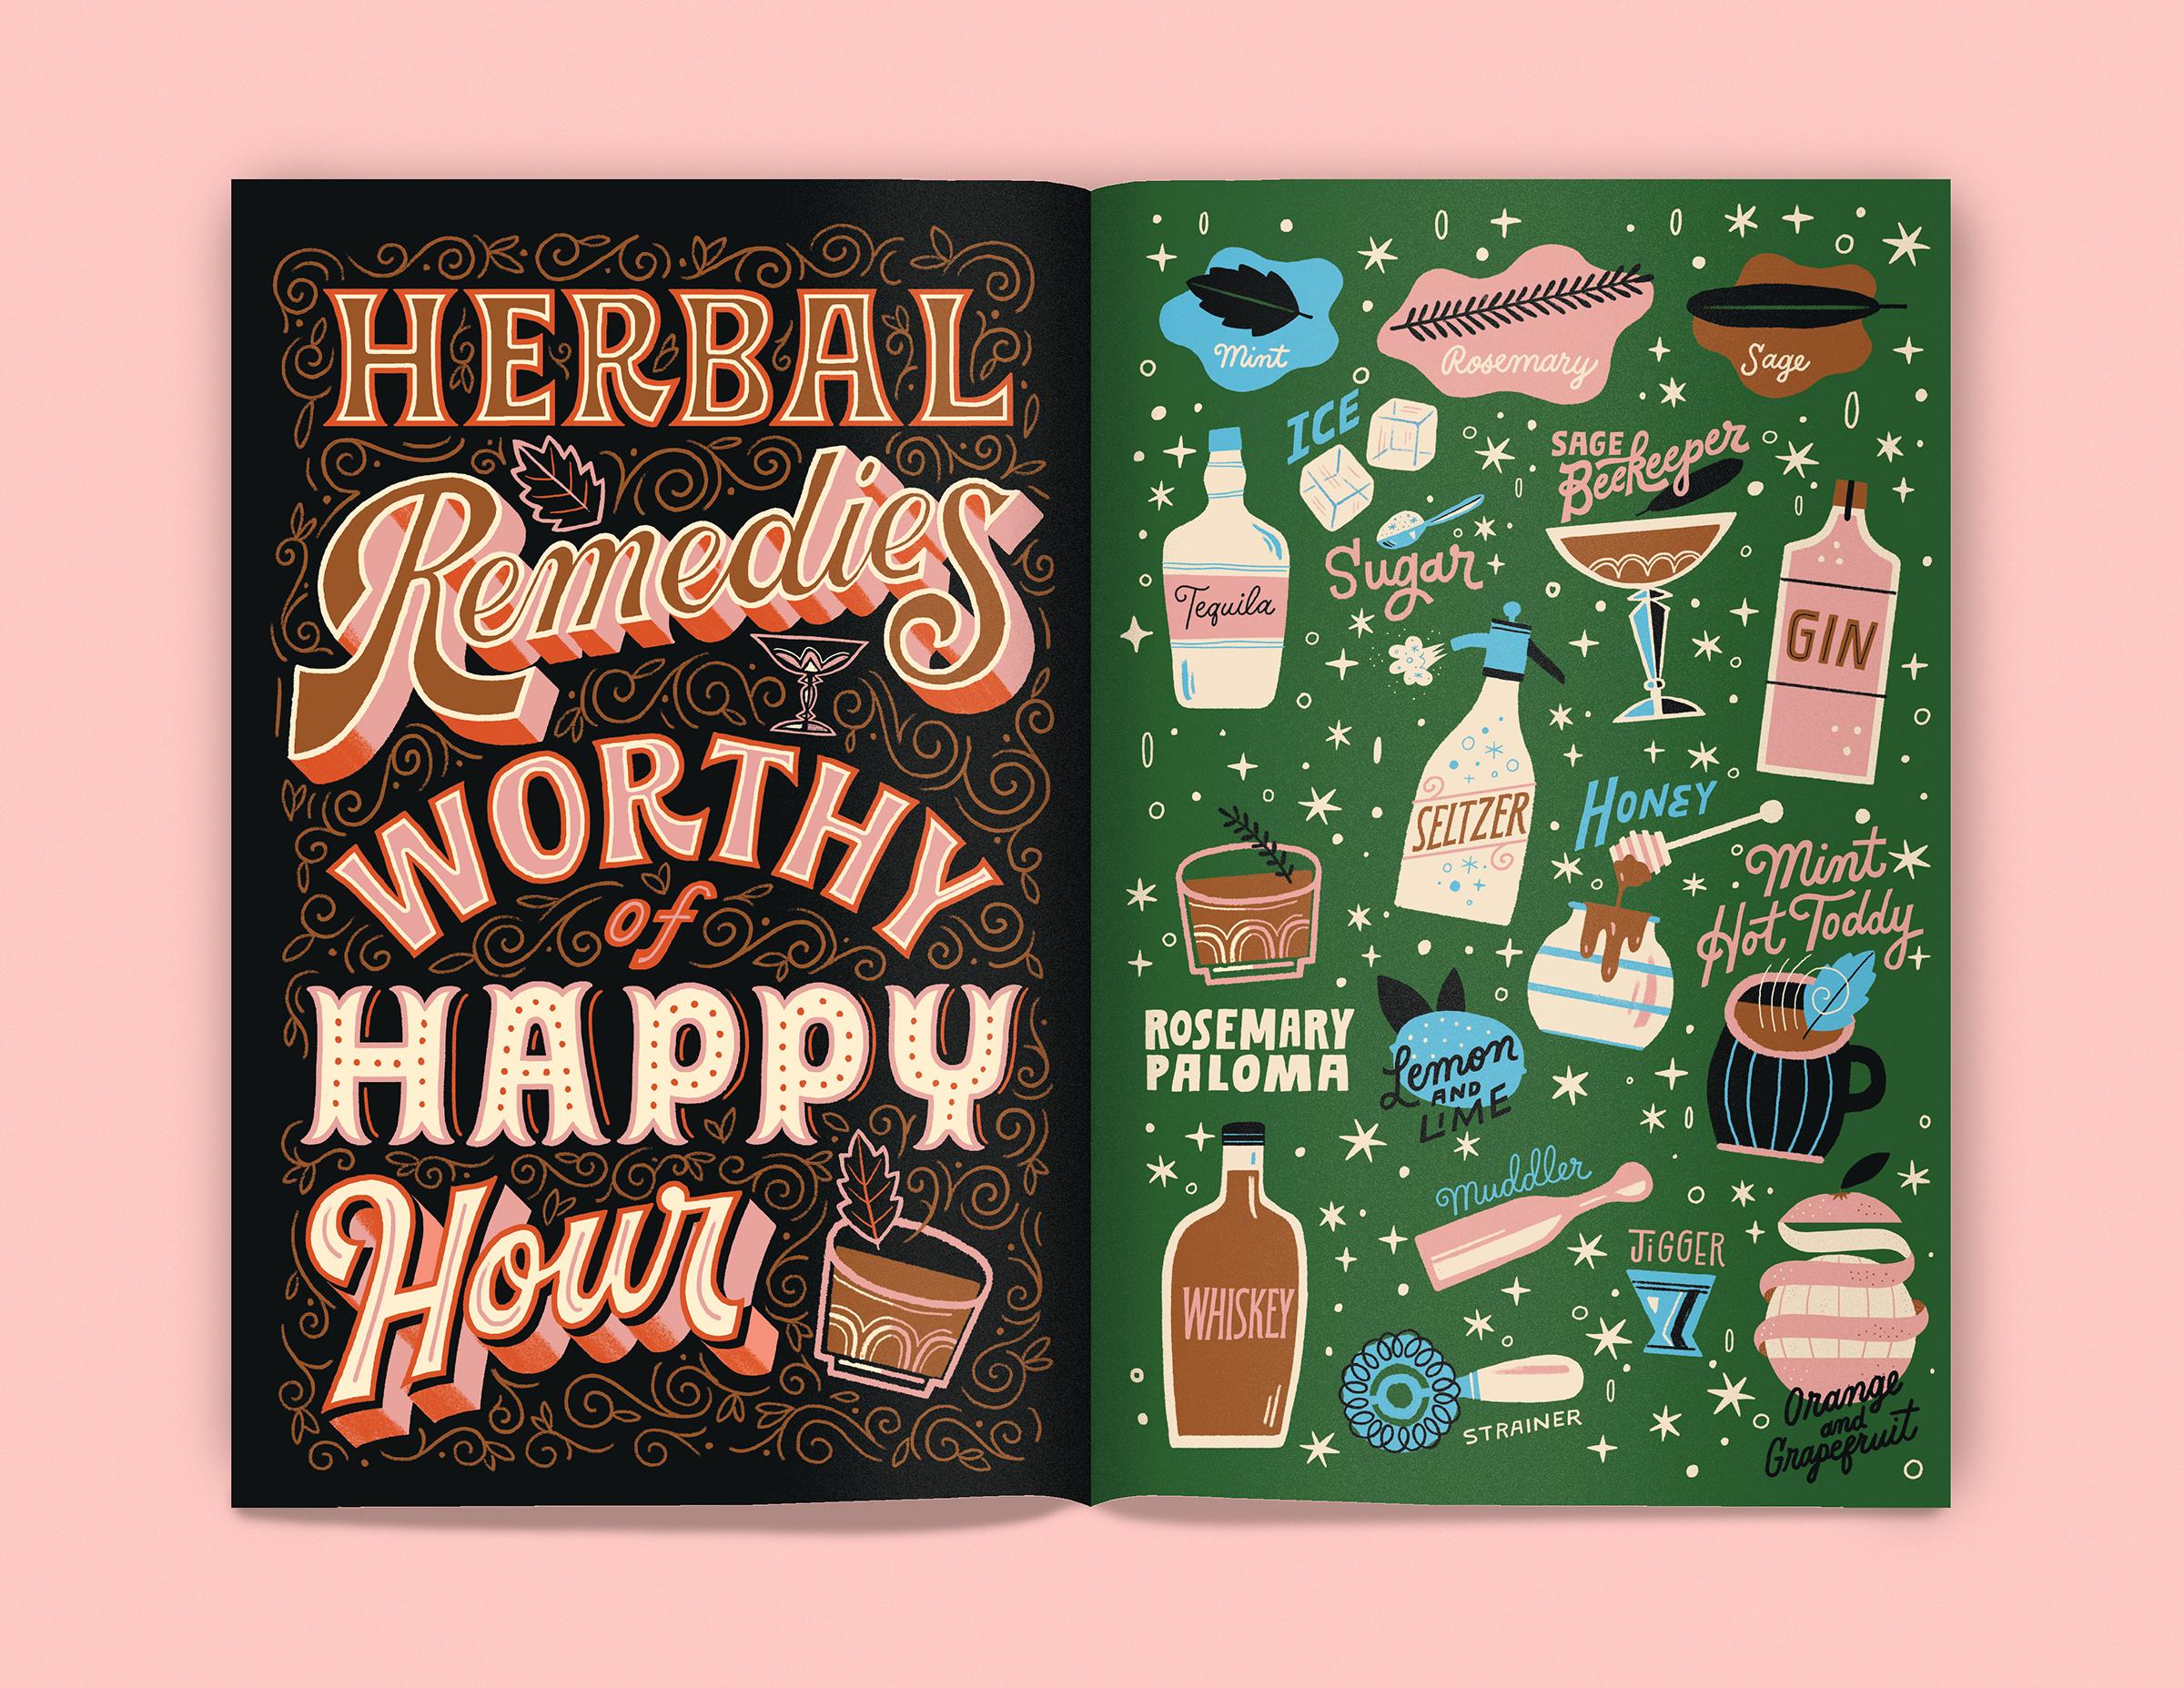 Herbal Cocktail Sampler by Mary Kate McDevit